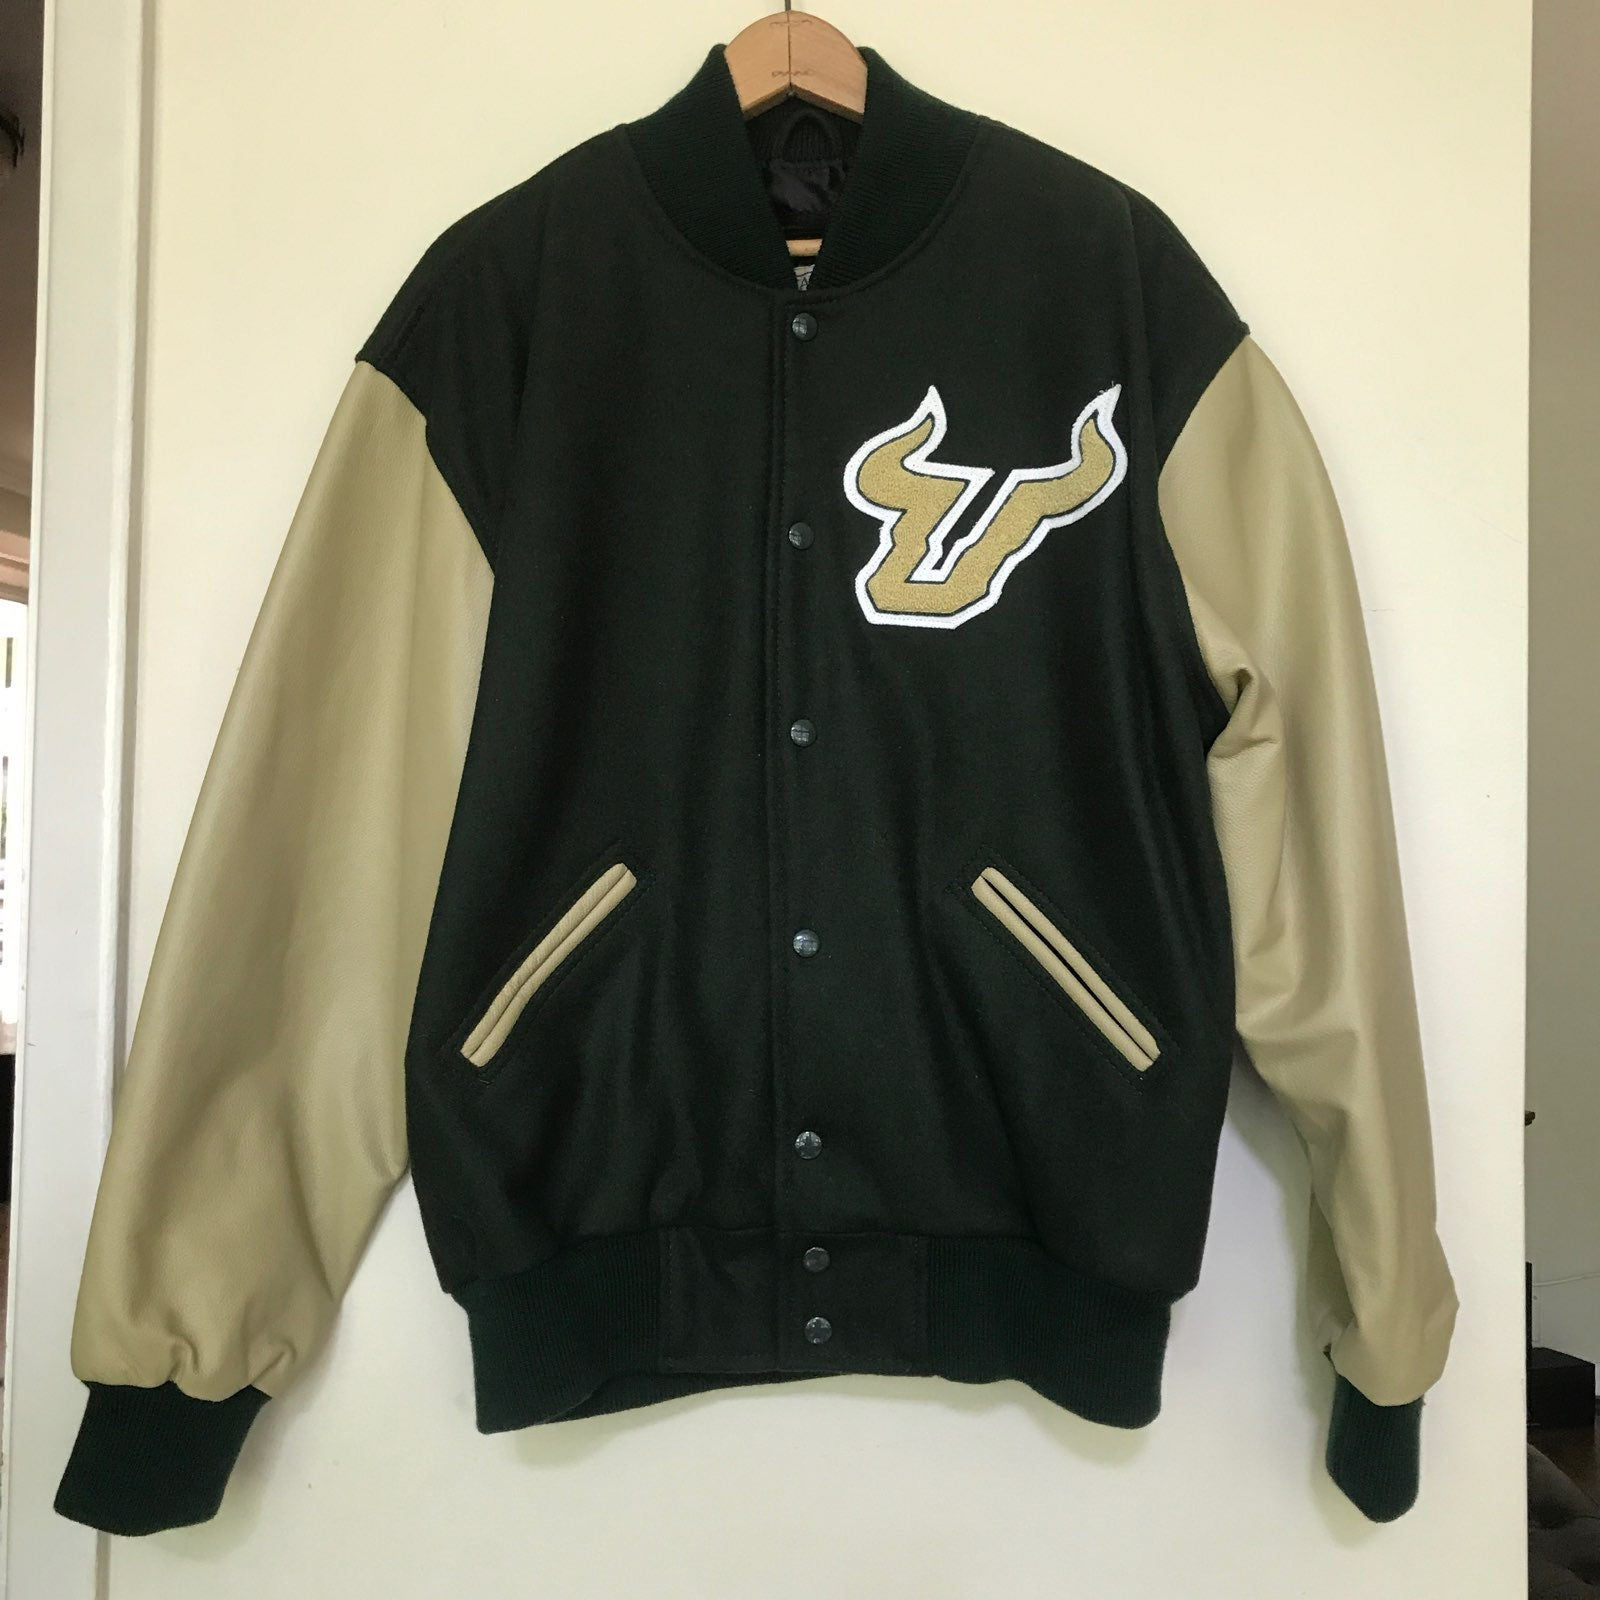 USF Bulls Varsity Jacket Memorabilia